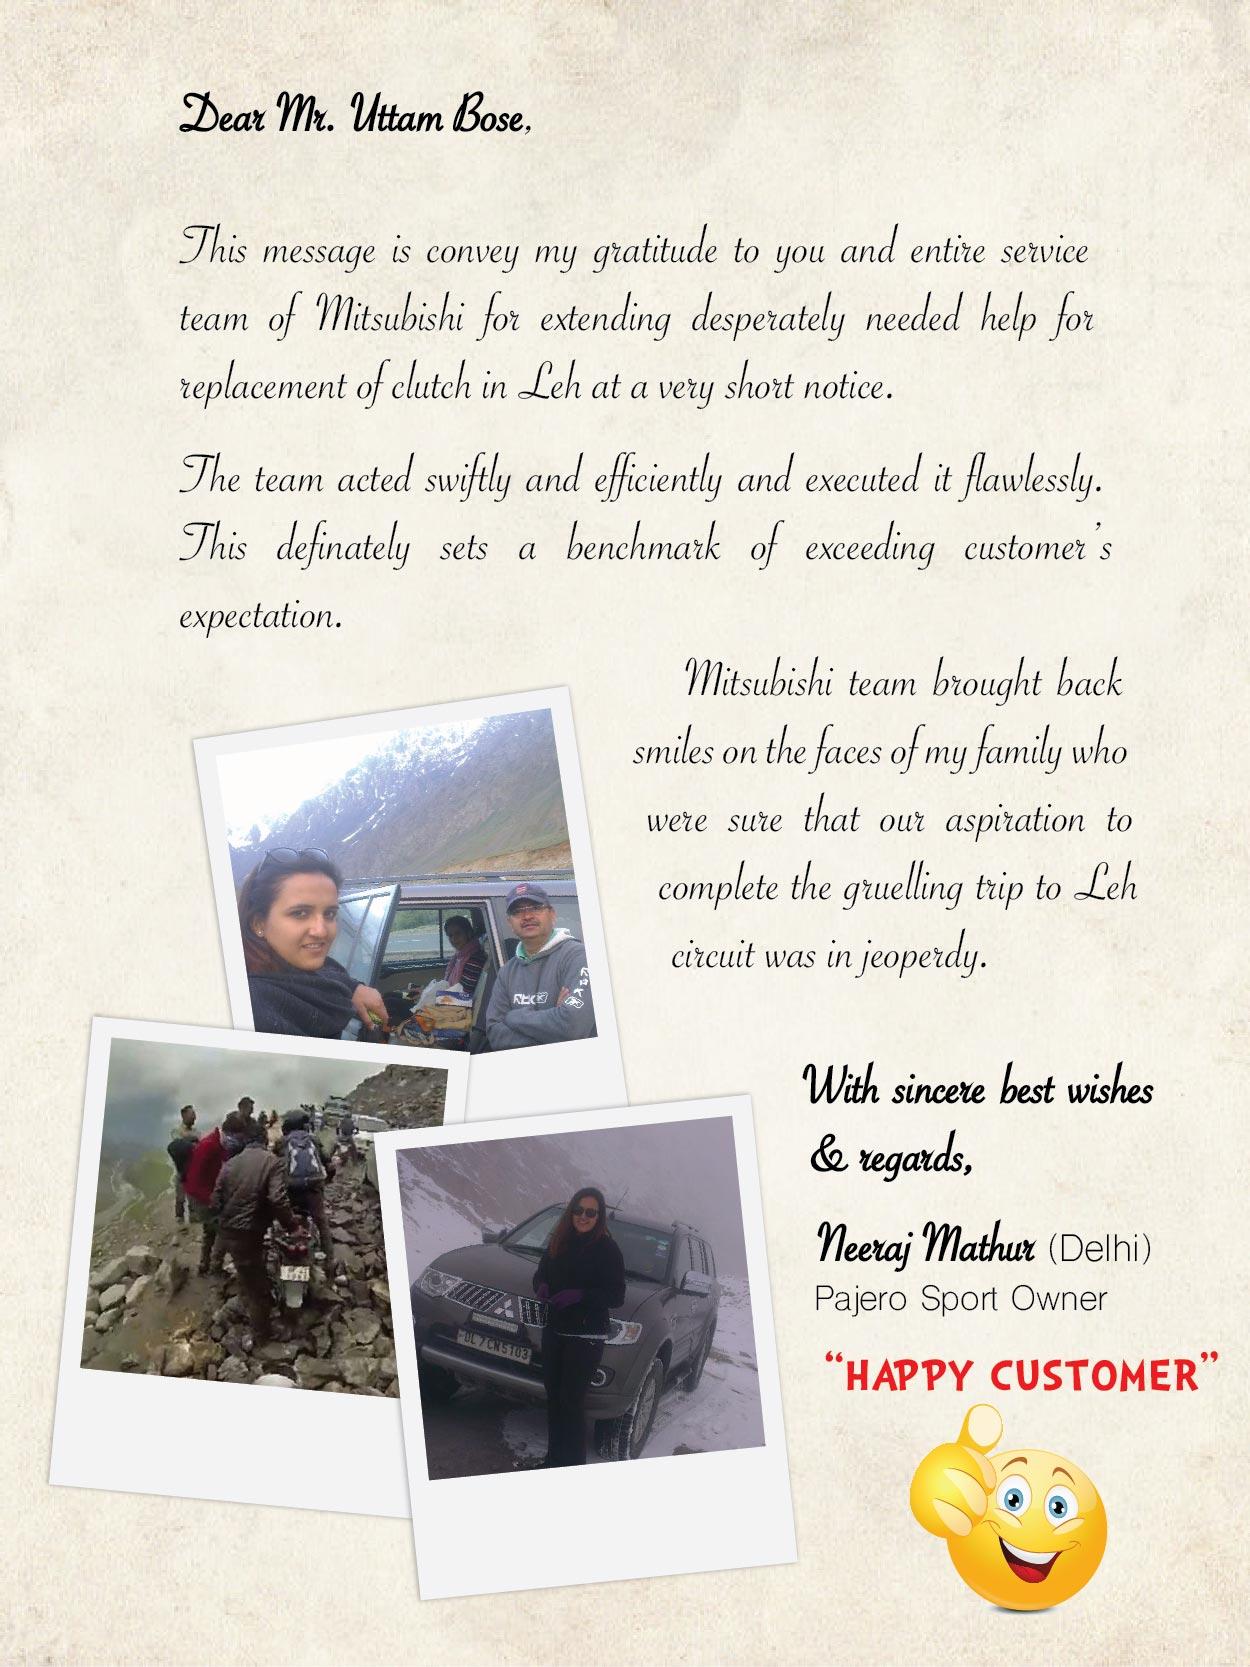 Customer delight for Mitsubishi motors customer service